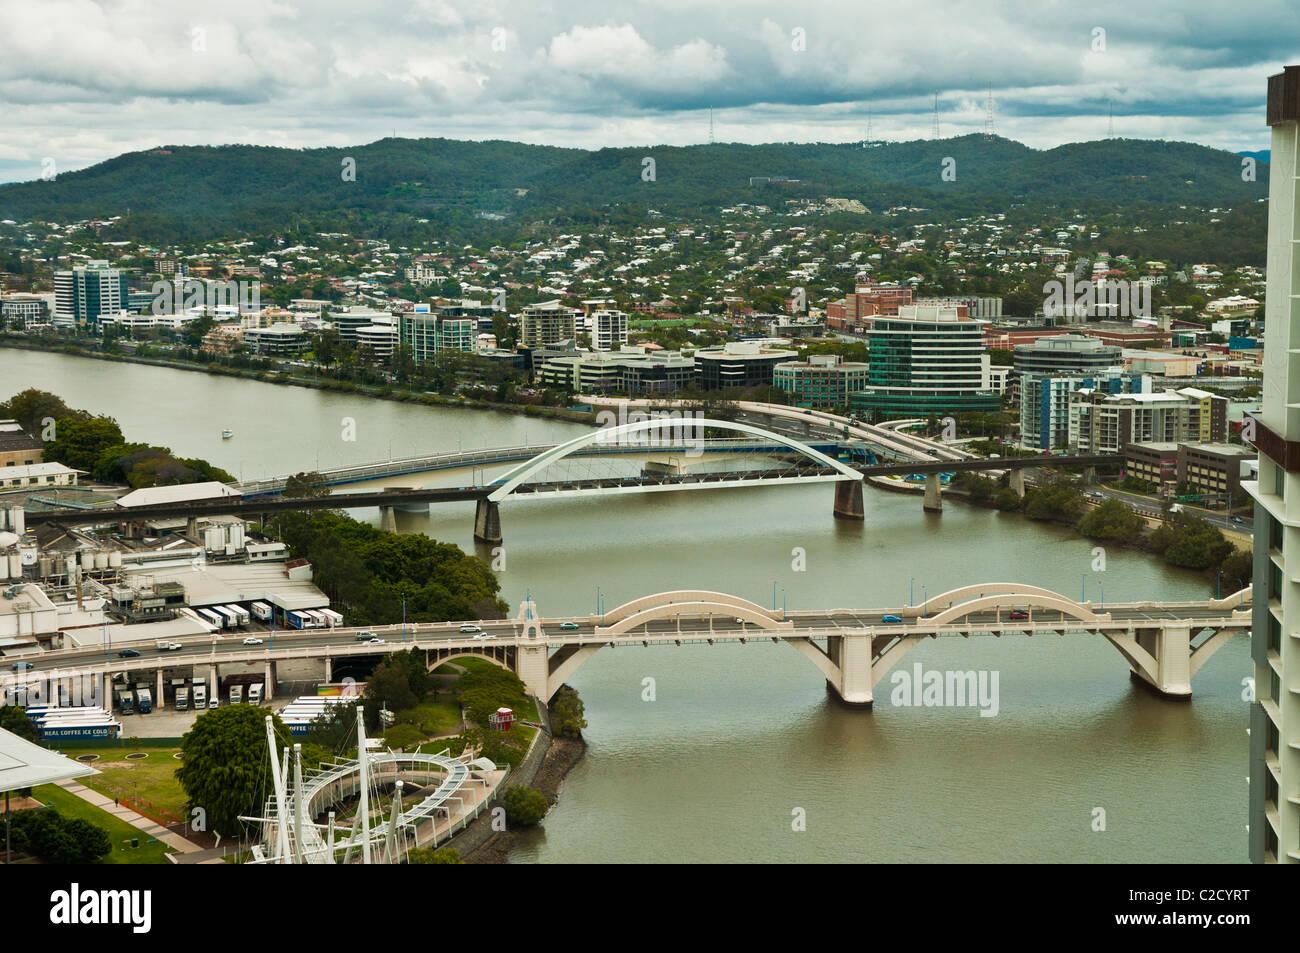 Brisbane City from Santos Place, Brisbane CBD, Queensland, Australia - Stock Image